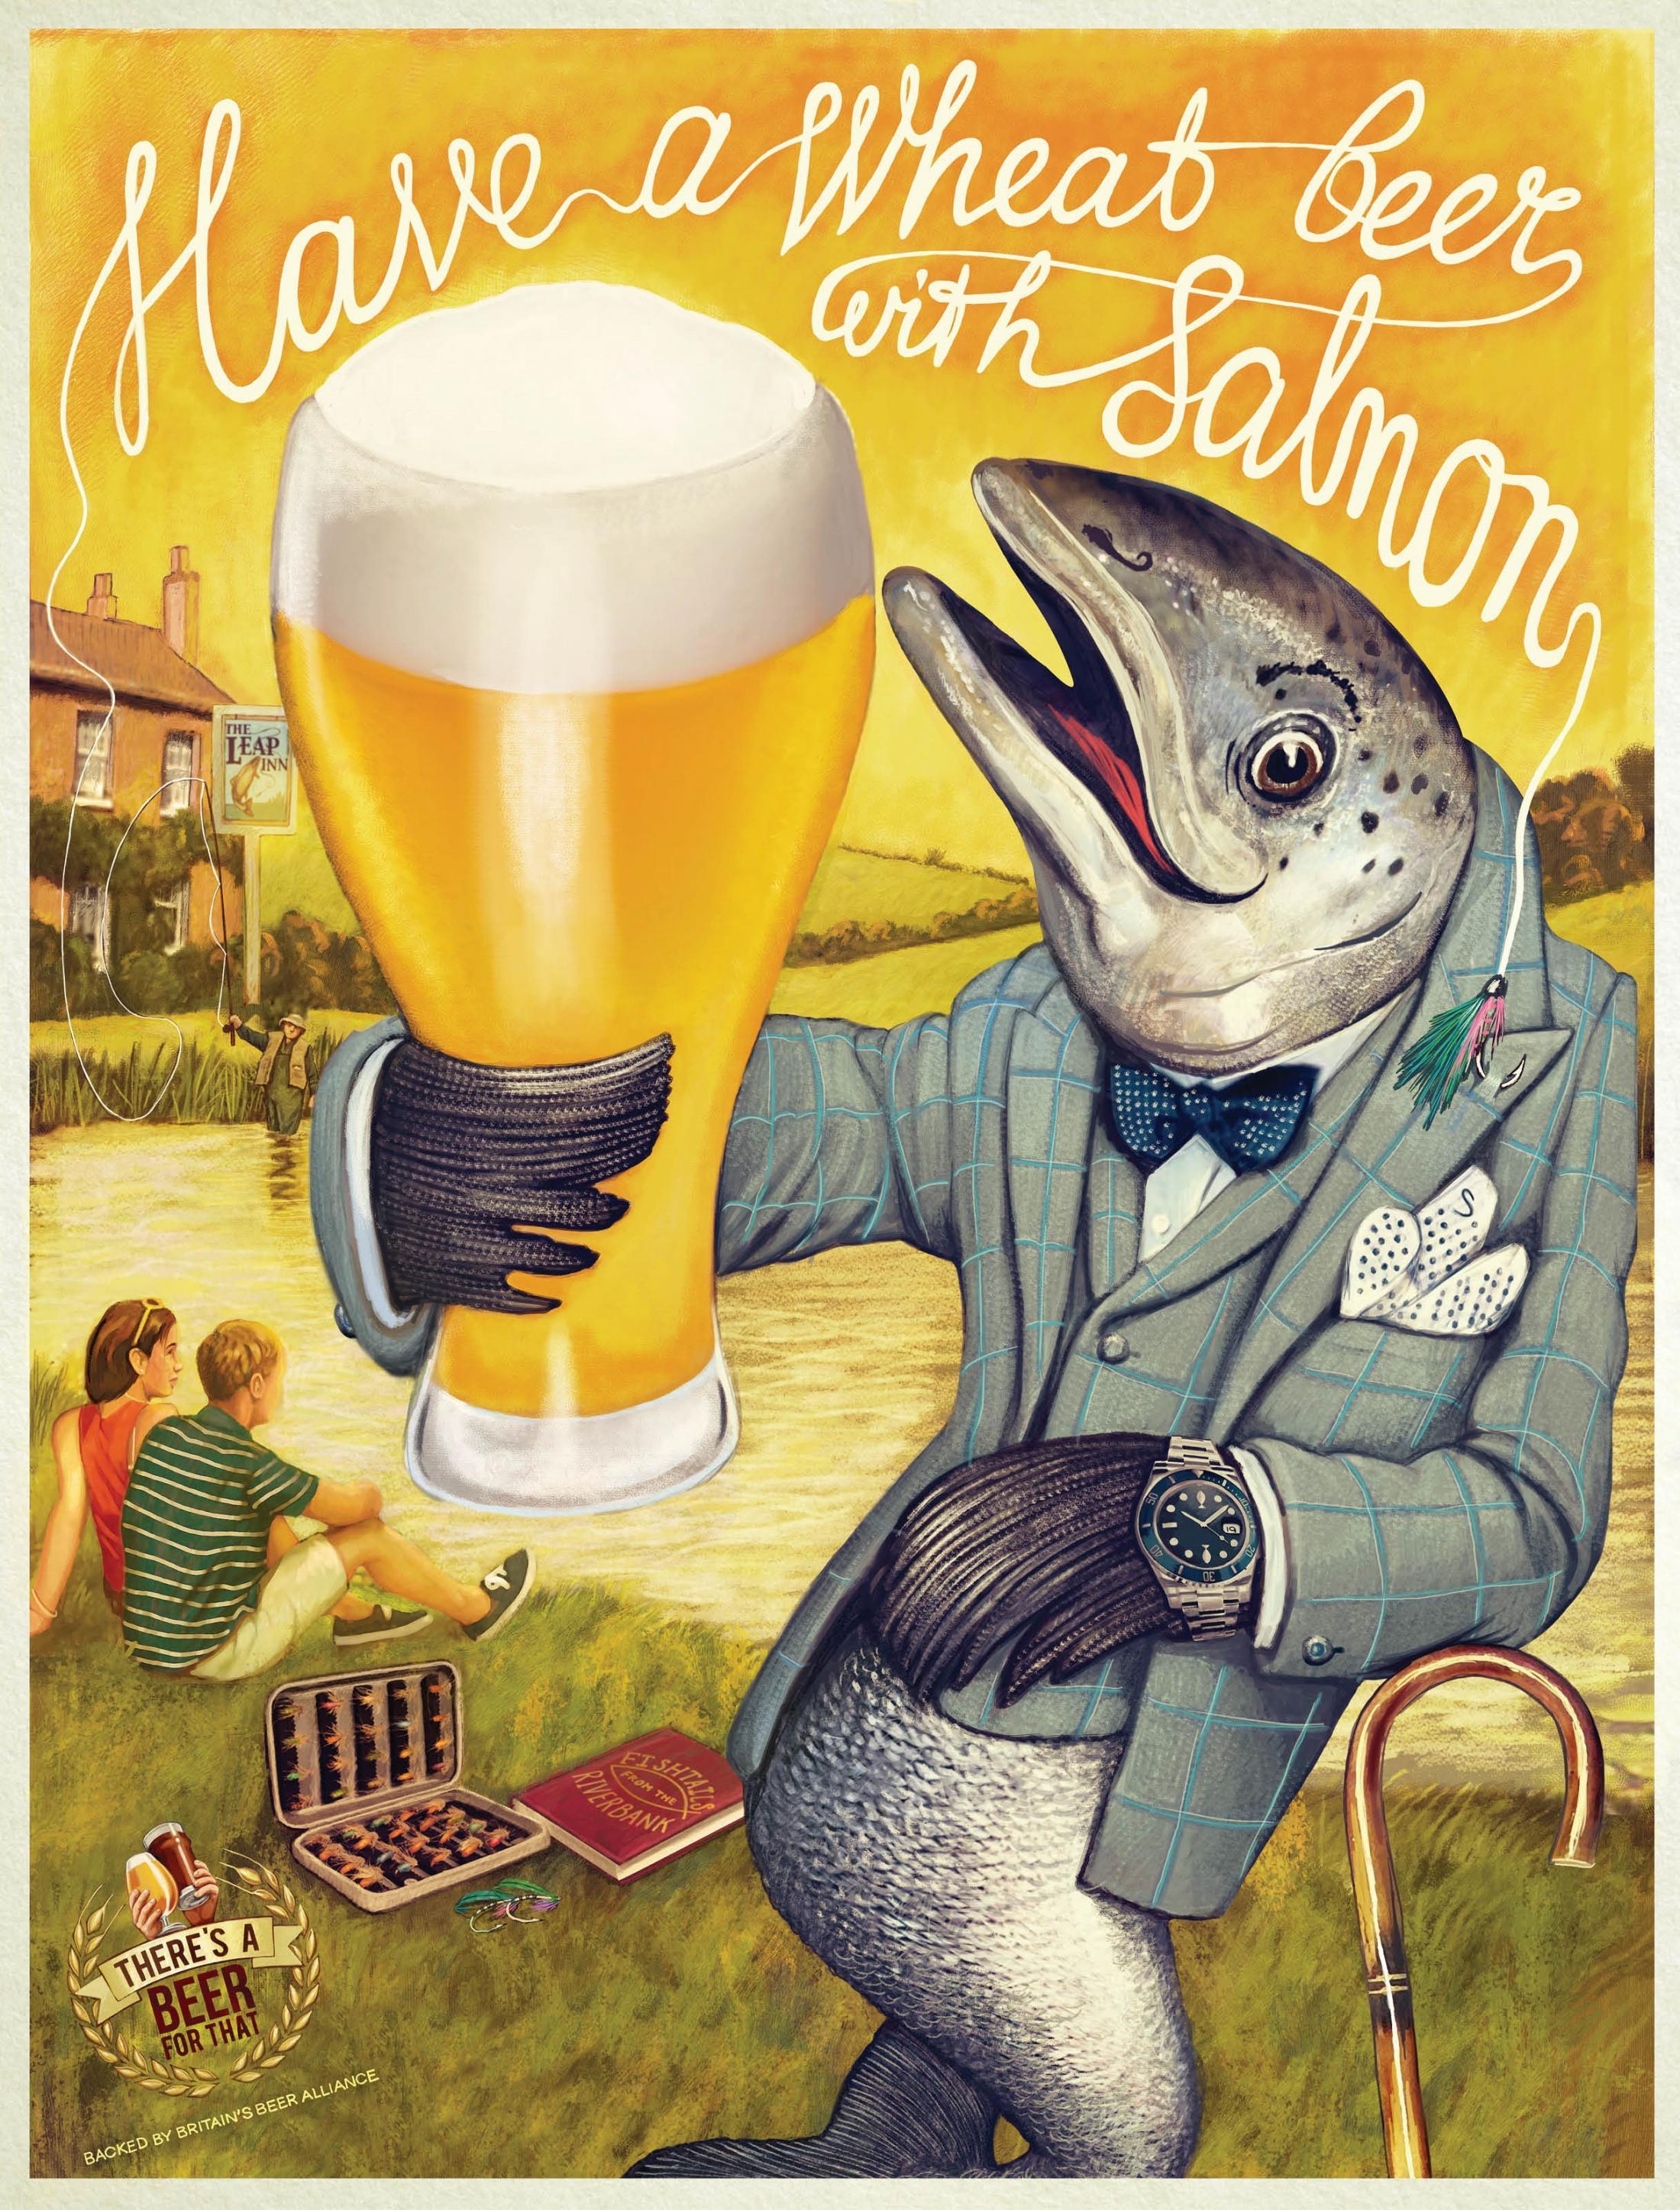 Britain's Beer Alliance Print Ad - Salmon